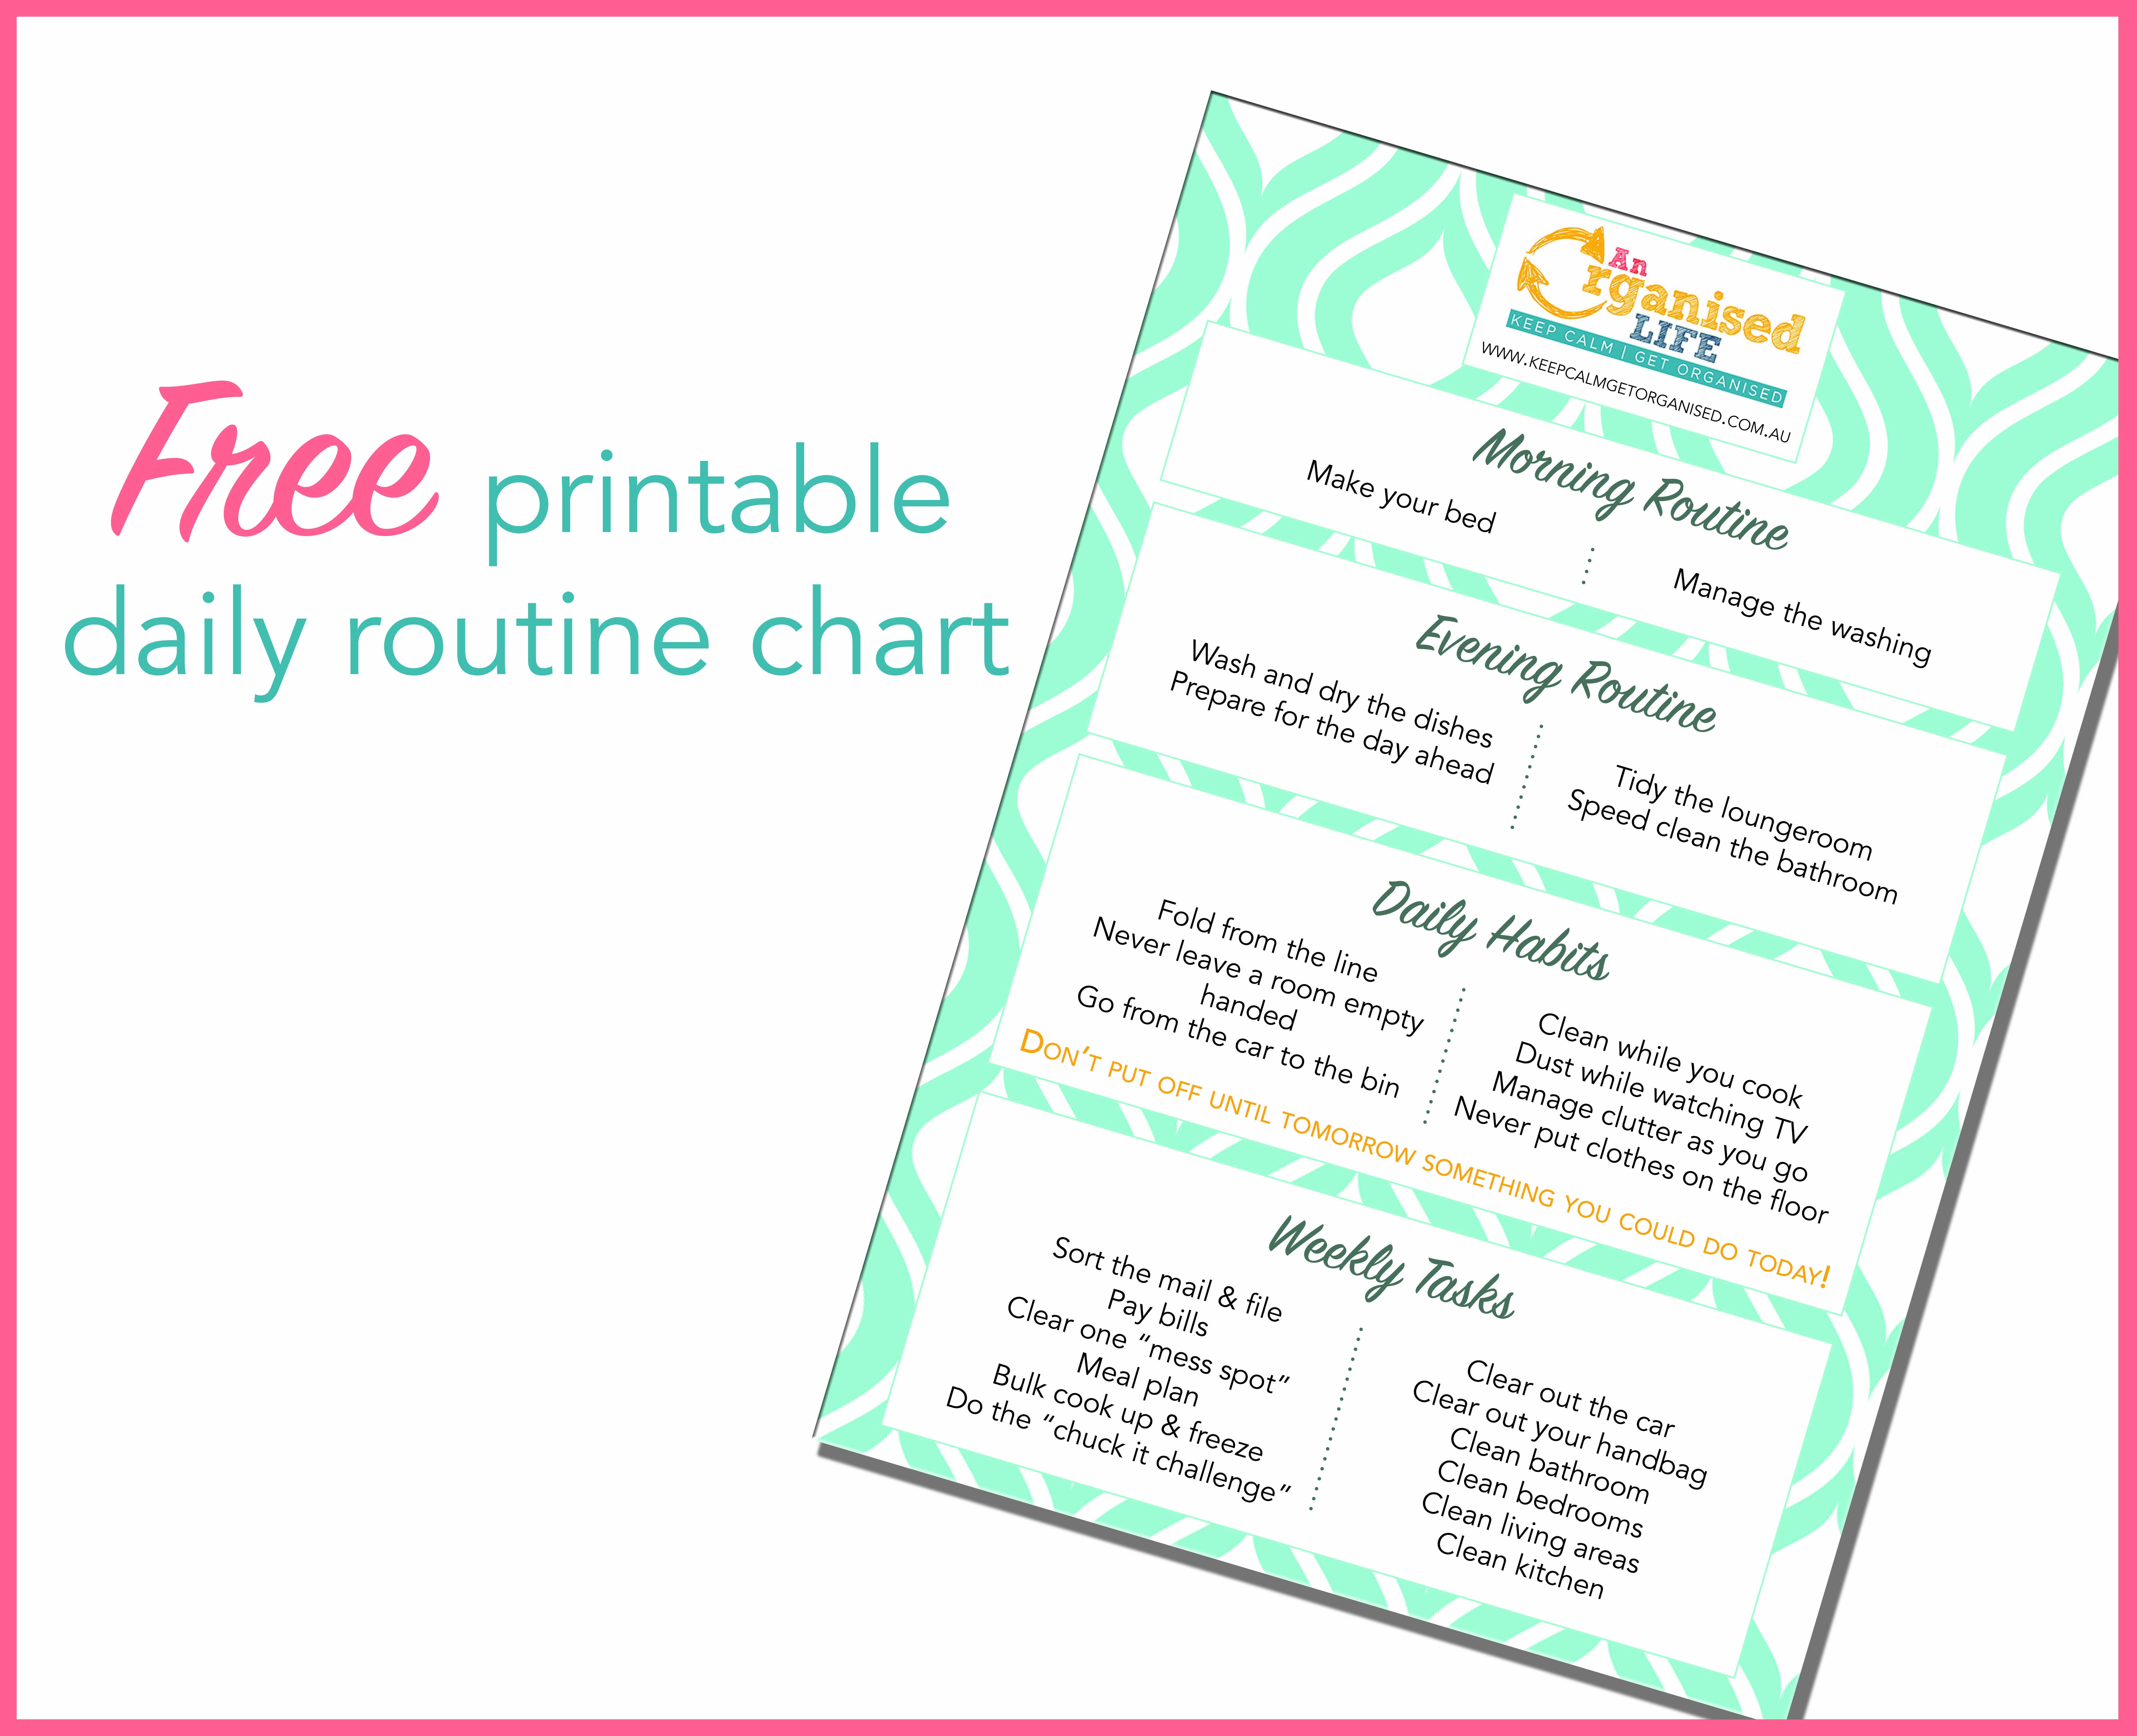 Free Printable Daily Routine Chart   Keep Calm Get Organised - Free Printable Morning Routine Chart